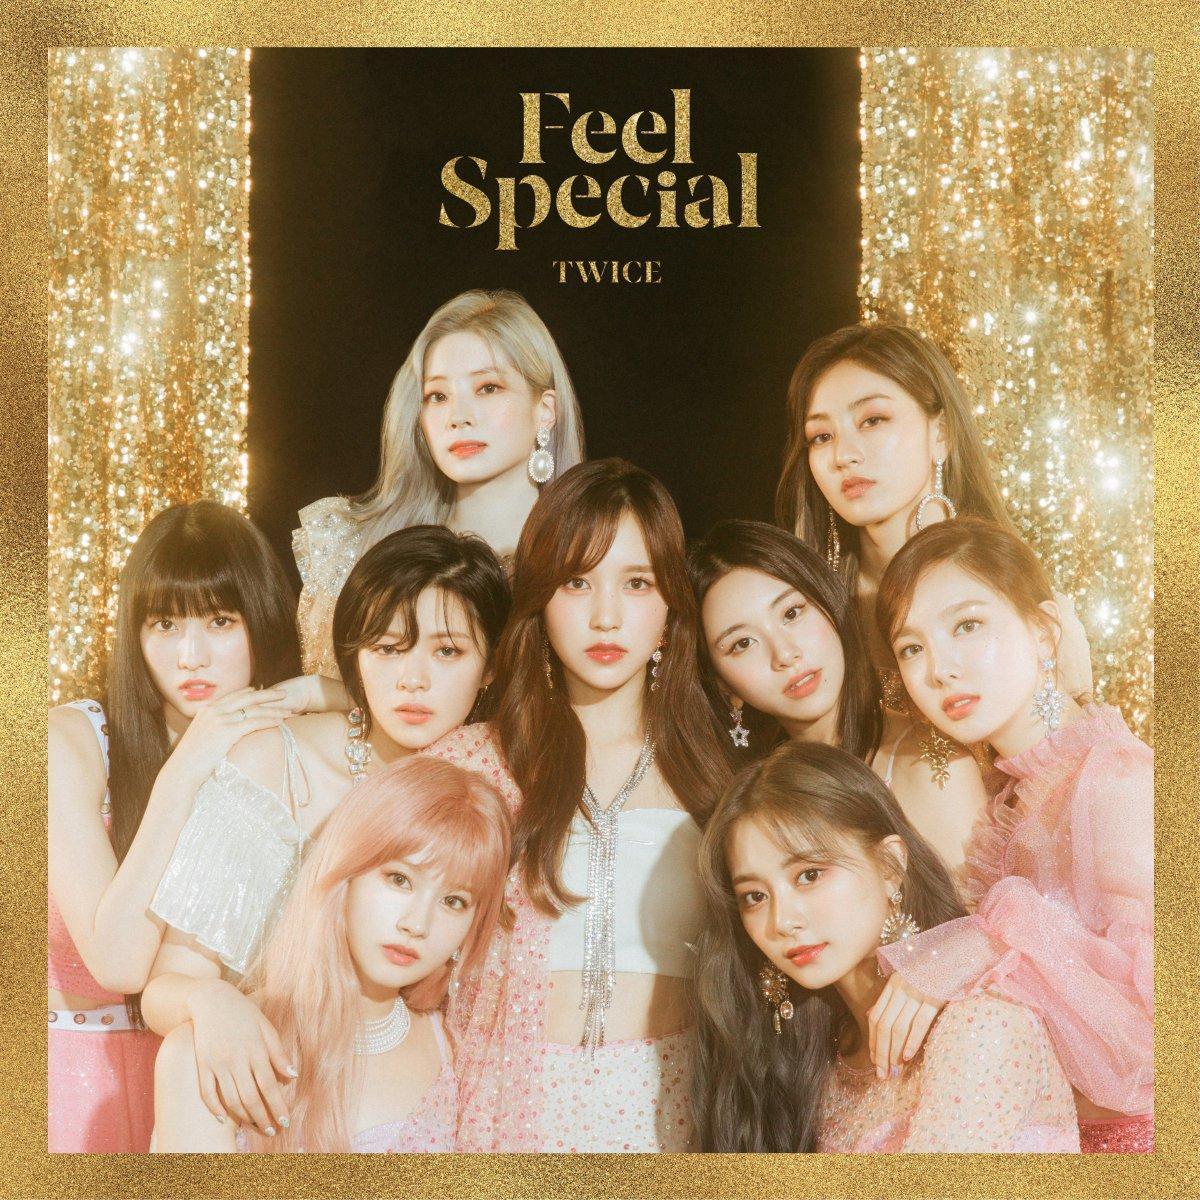 Feel Special - TWICE(트와이스)